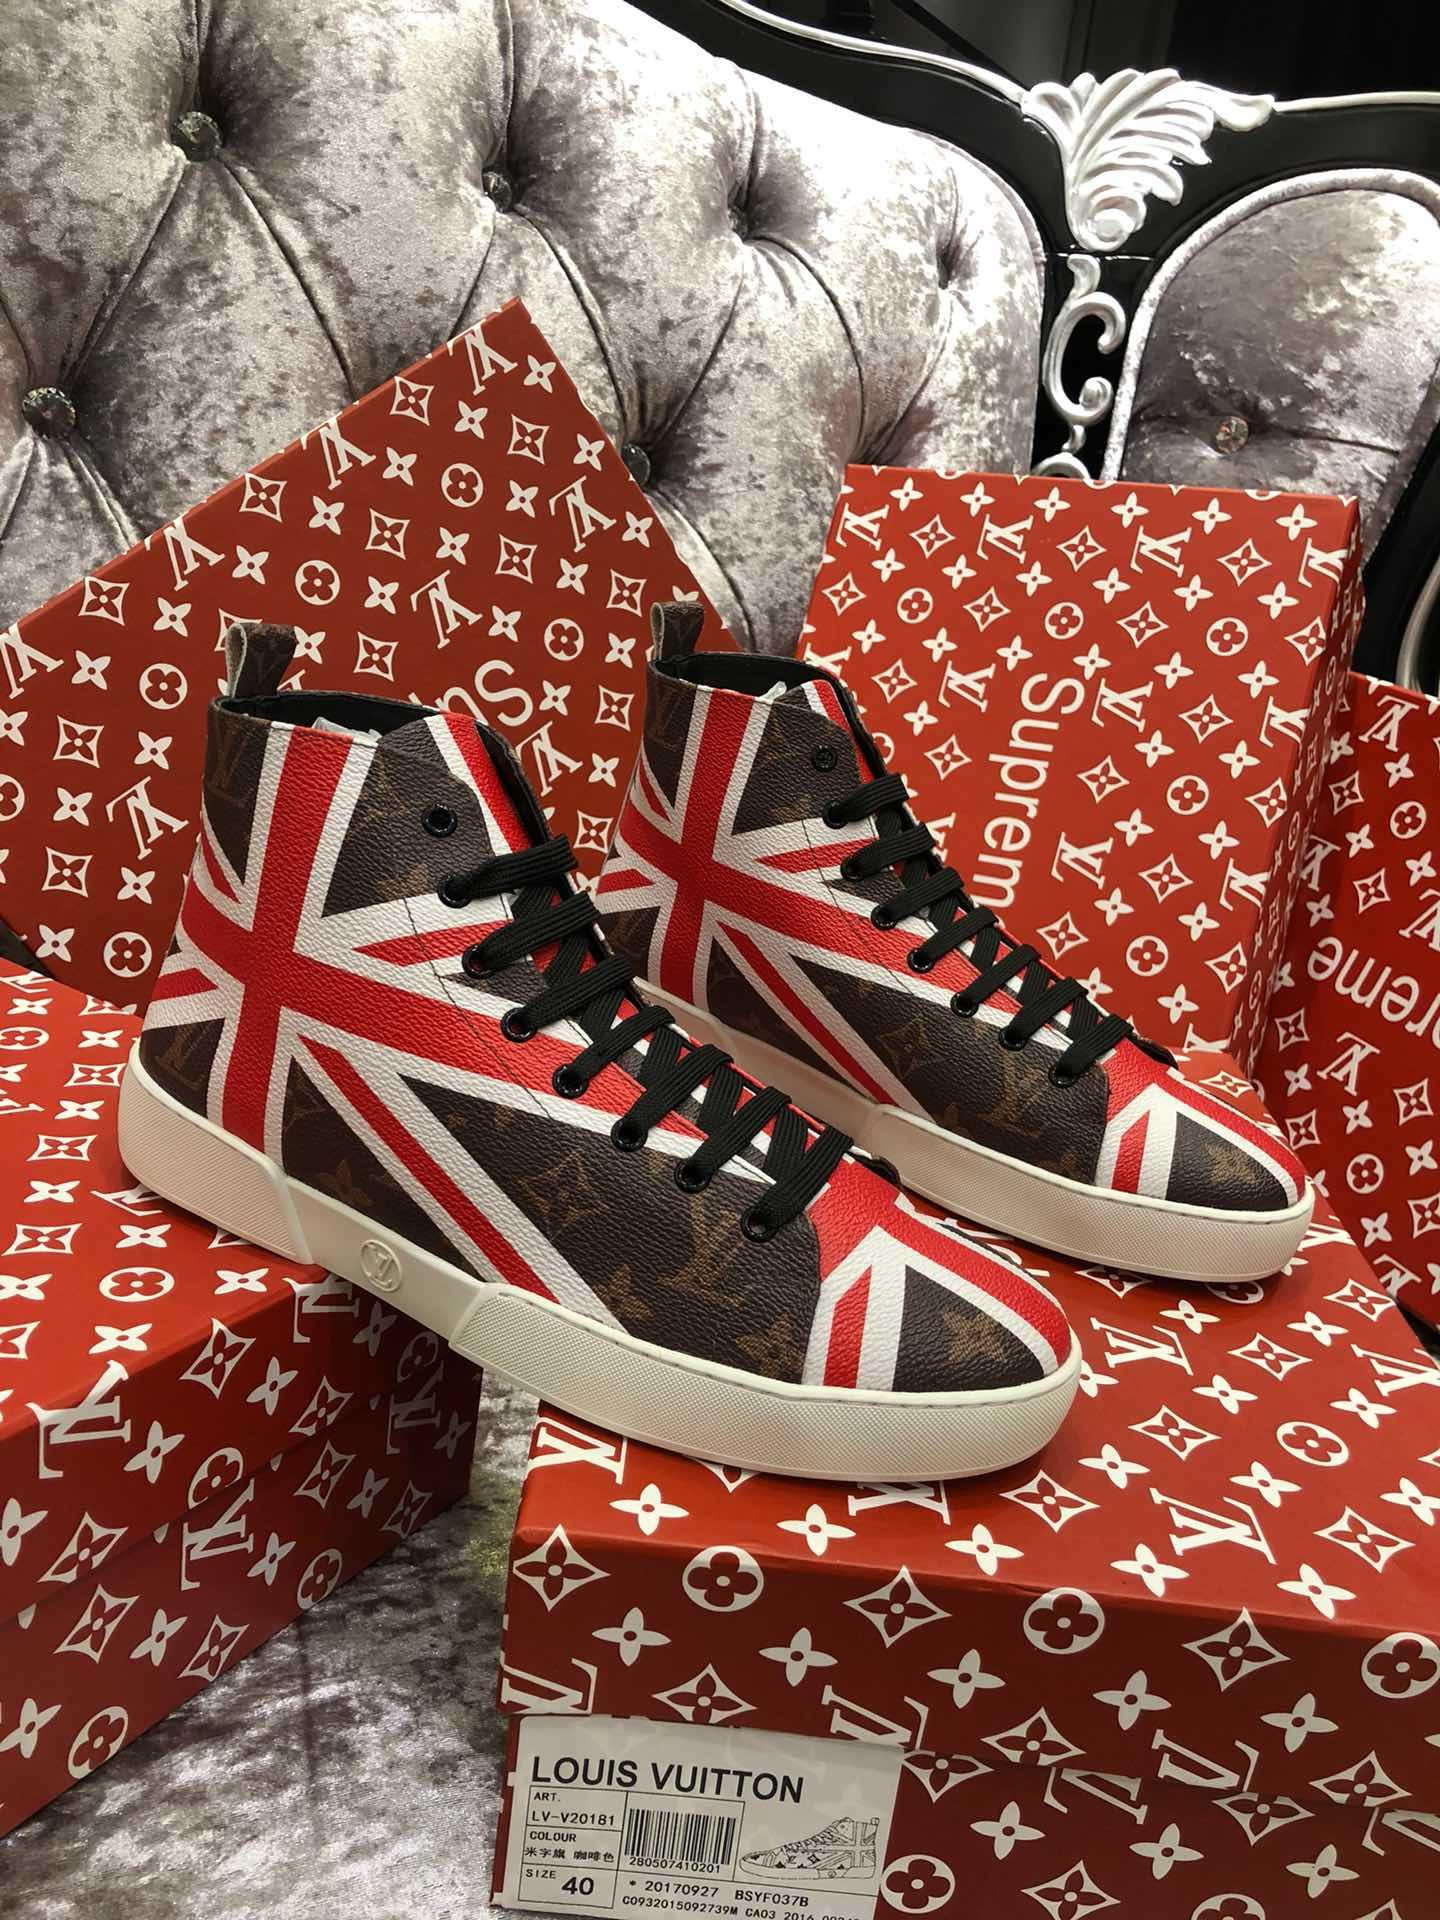 Supreme シュプリーム*ルイヴィトン 靴 メンズ 最新入荷 2色